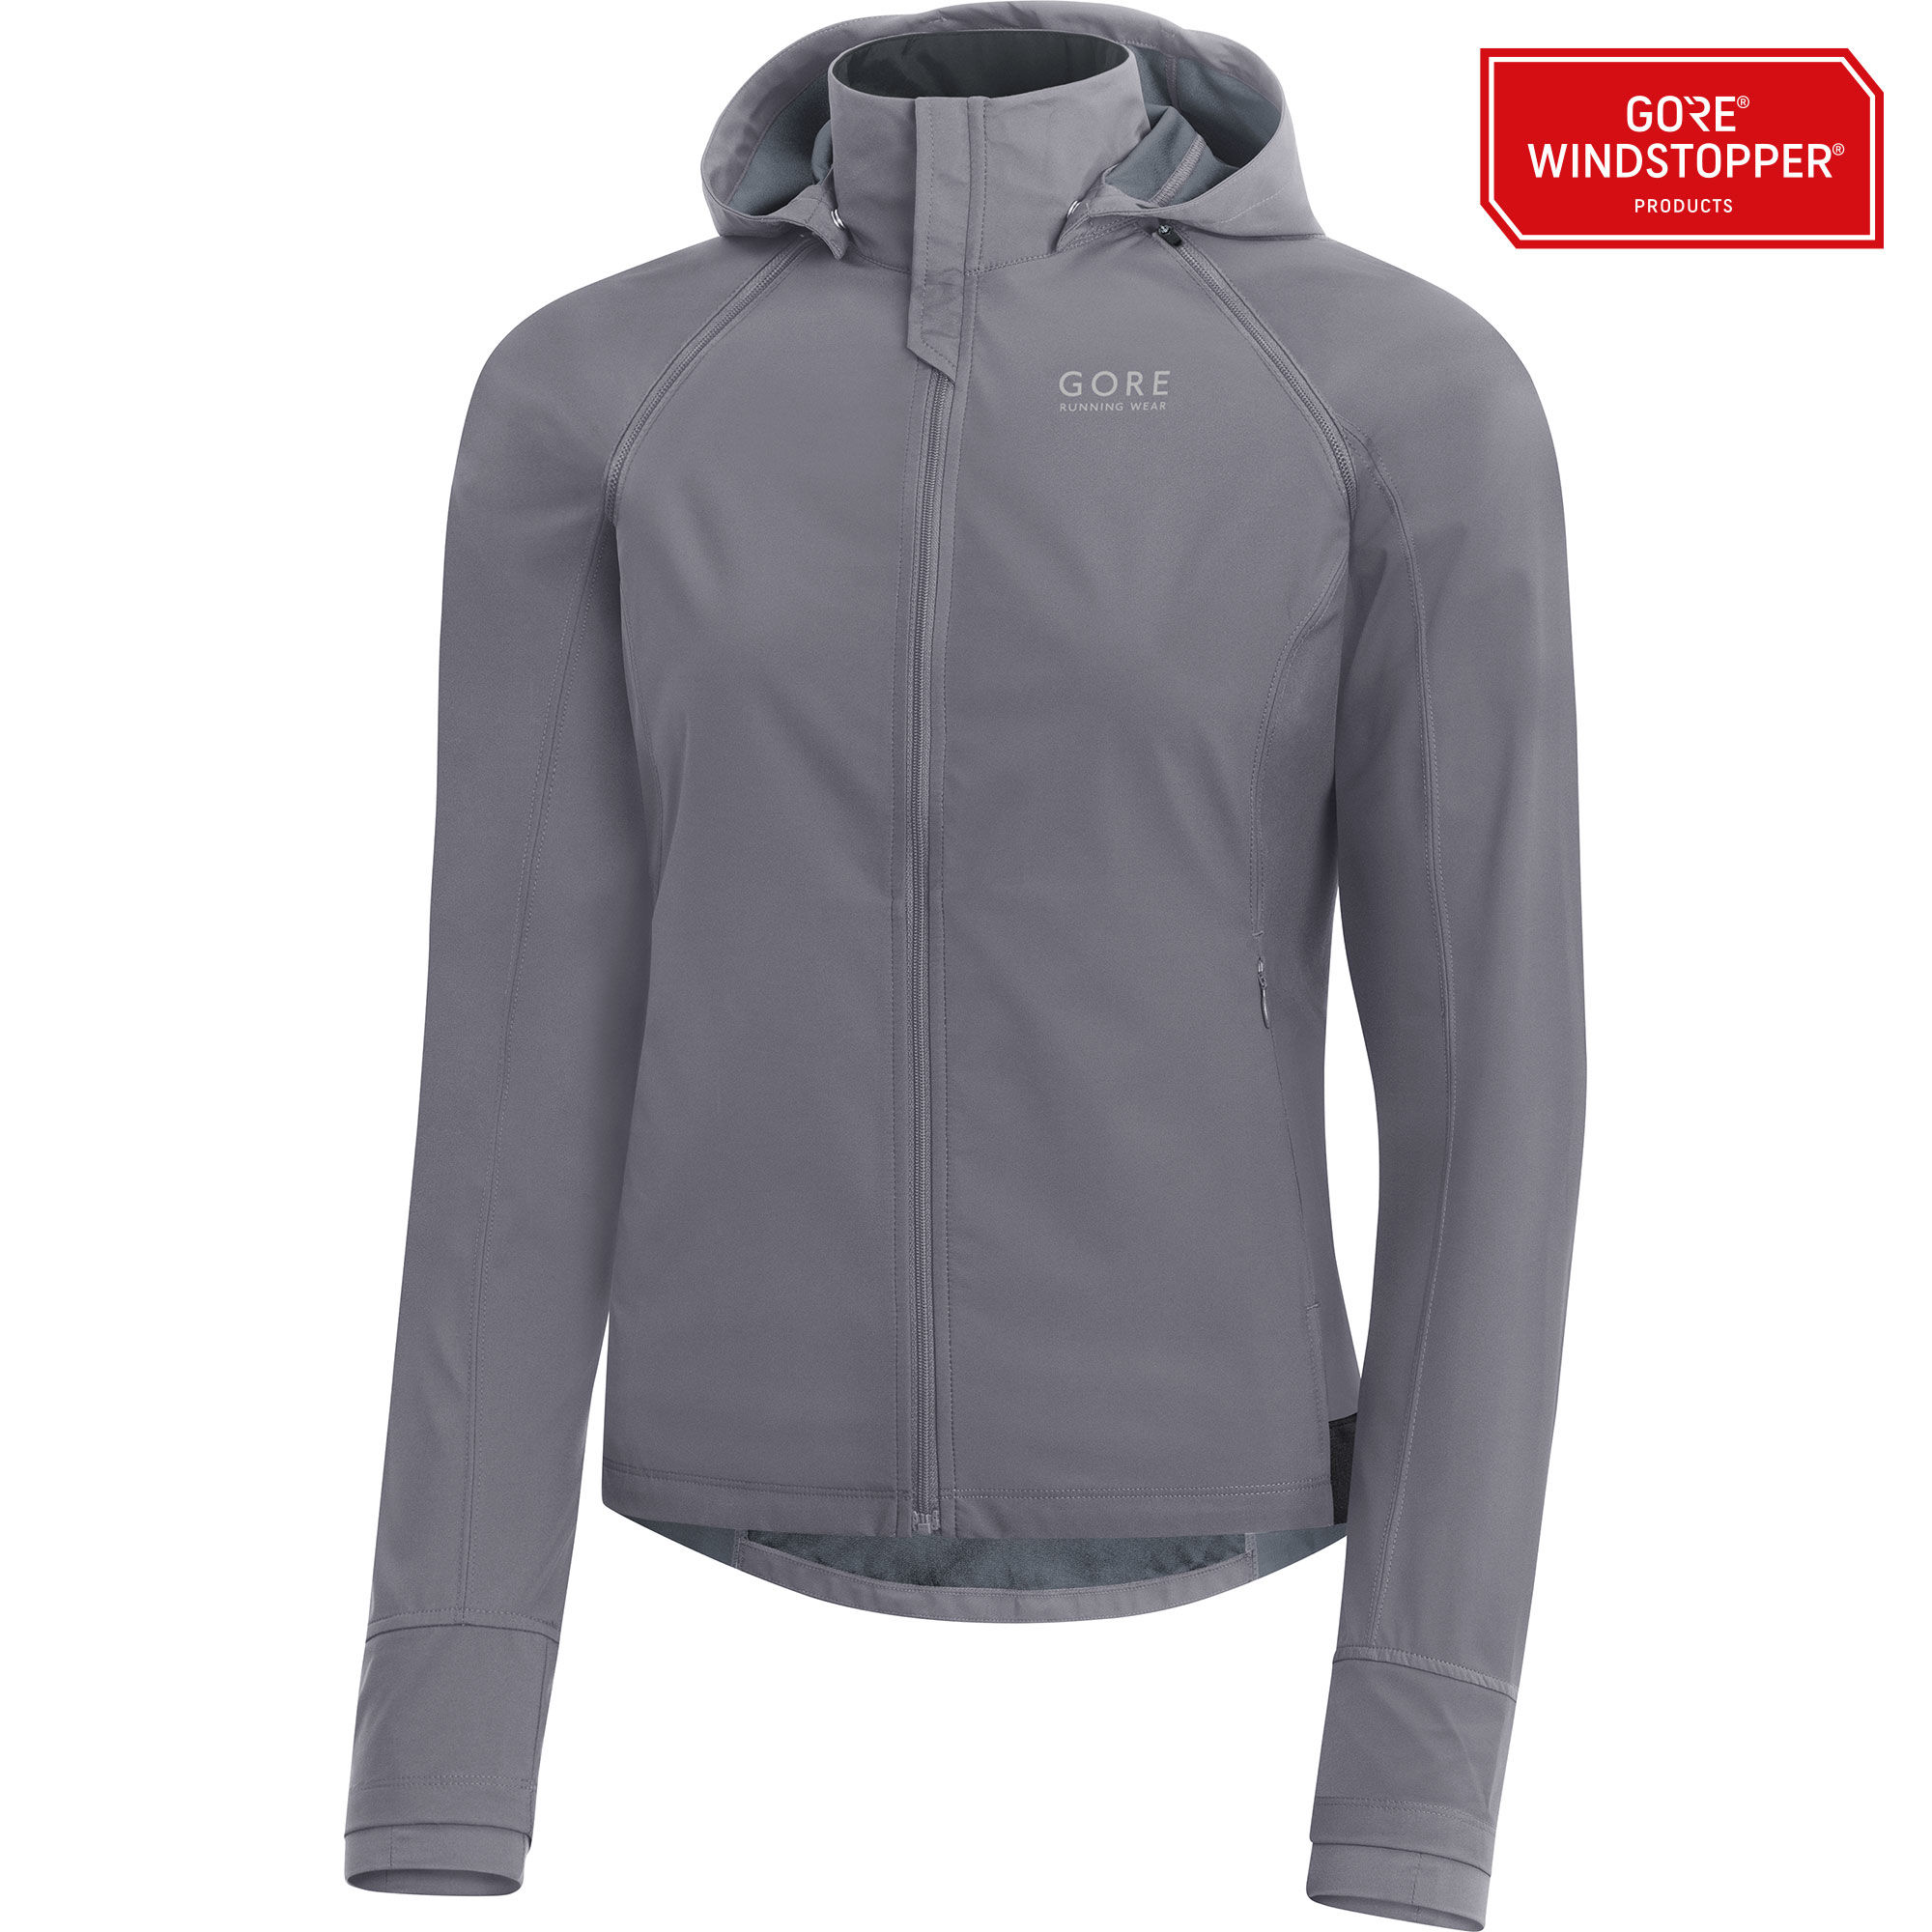 Gore Essential Lady GWS Zip-off Jacket in Grau